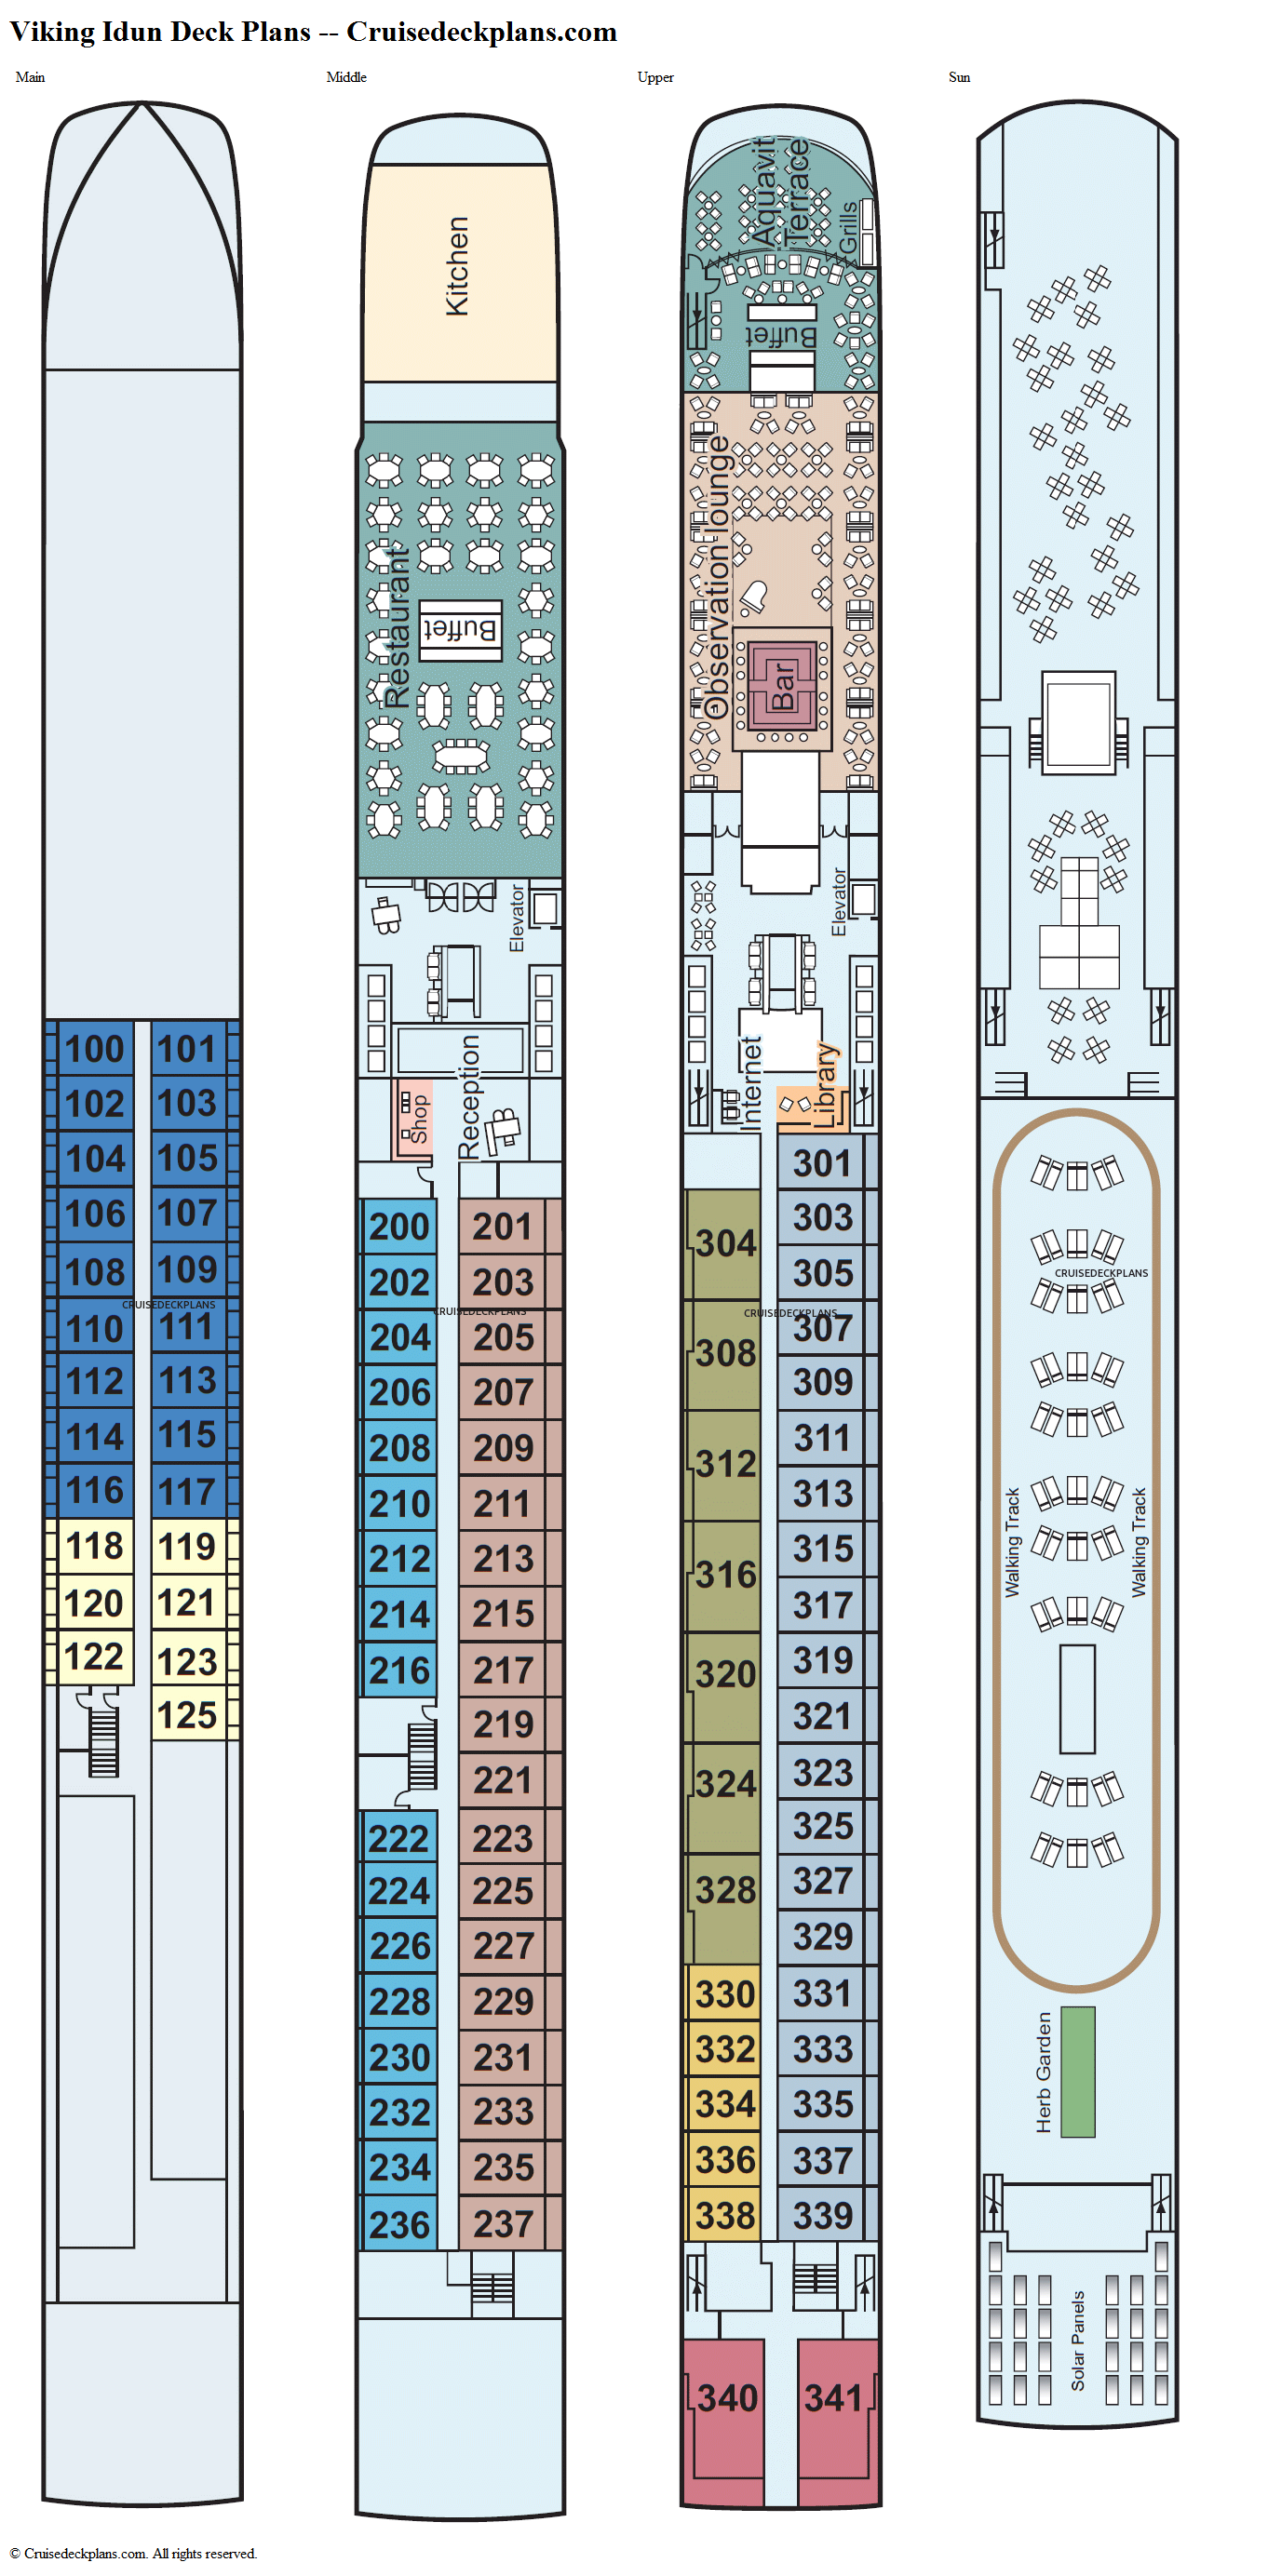 Viking Idun Deck Plans Diagrams Pictures Video